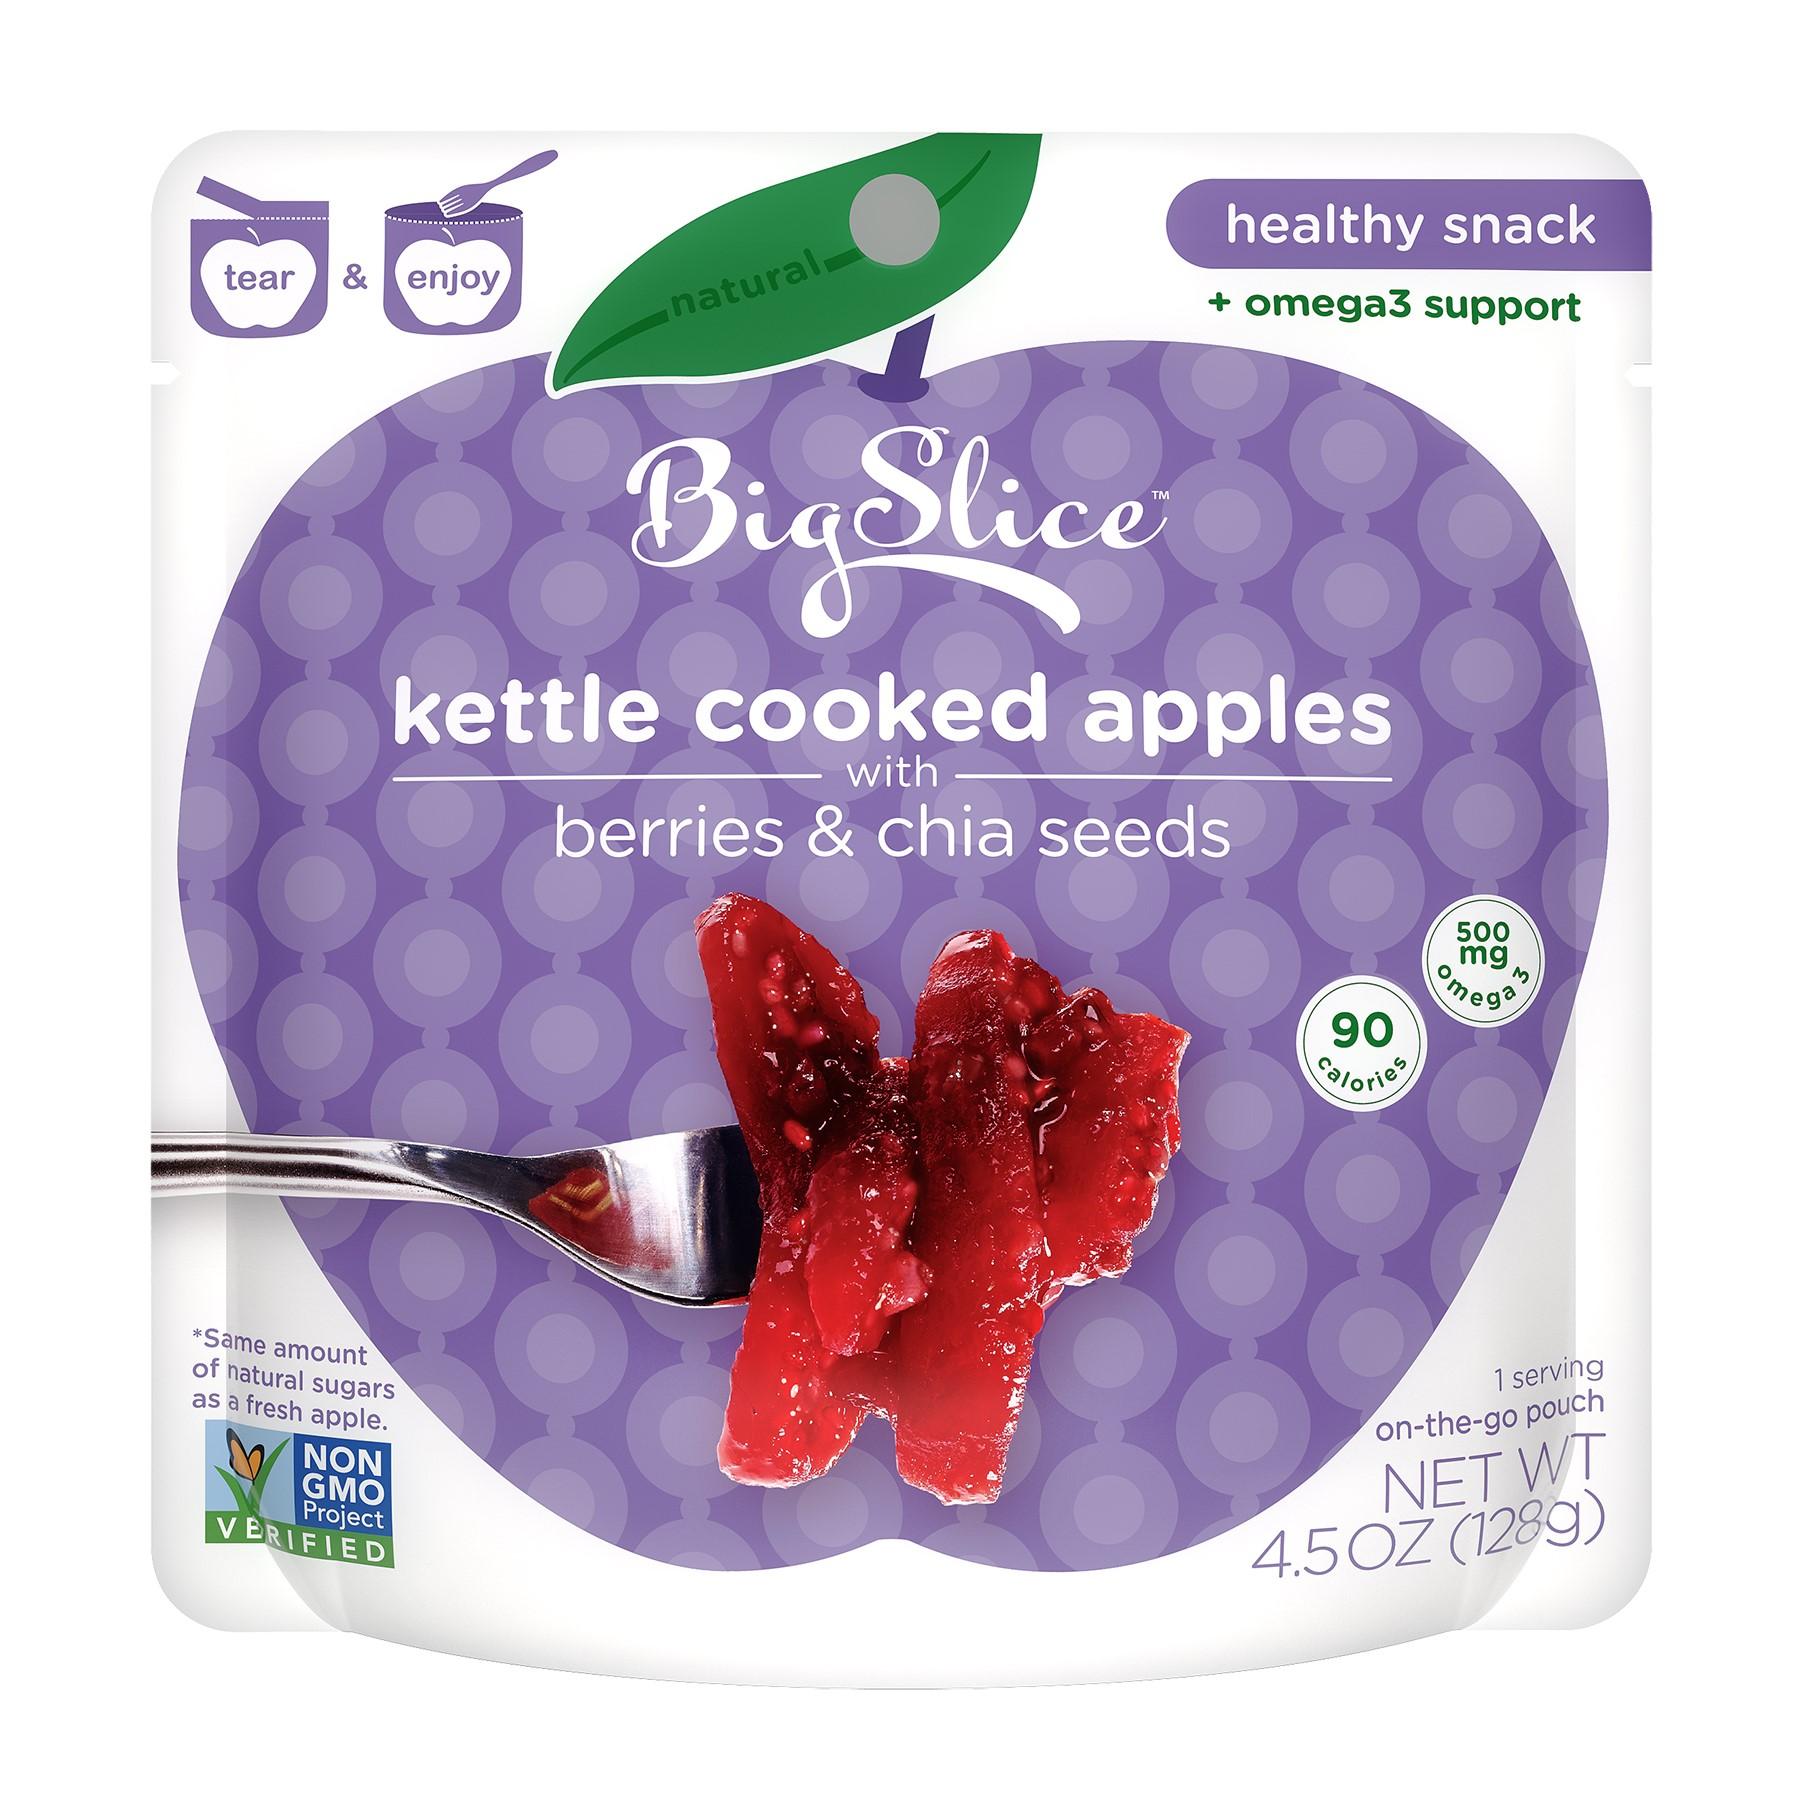 Big Slice: Kettle Cooked Apples